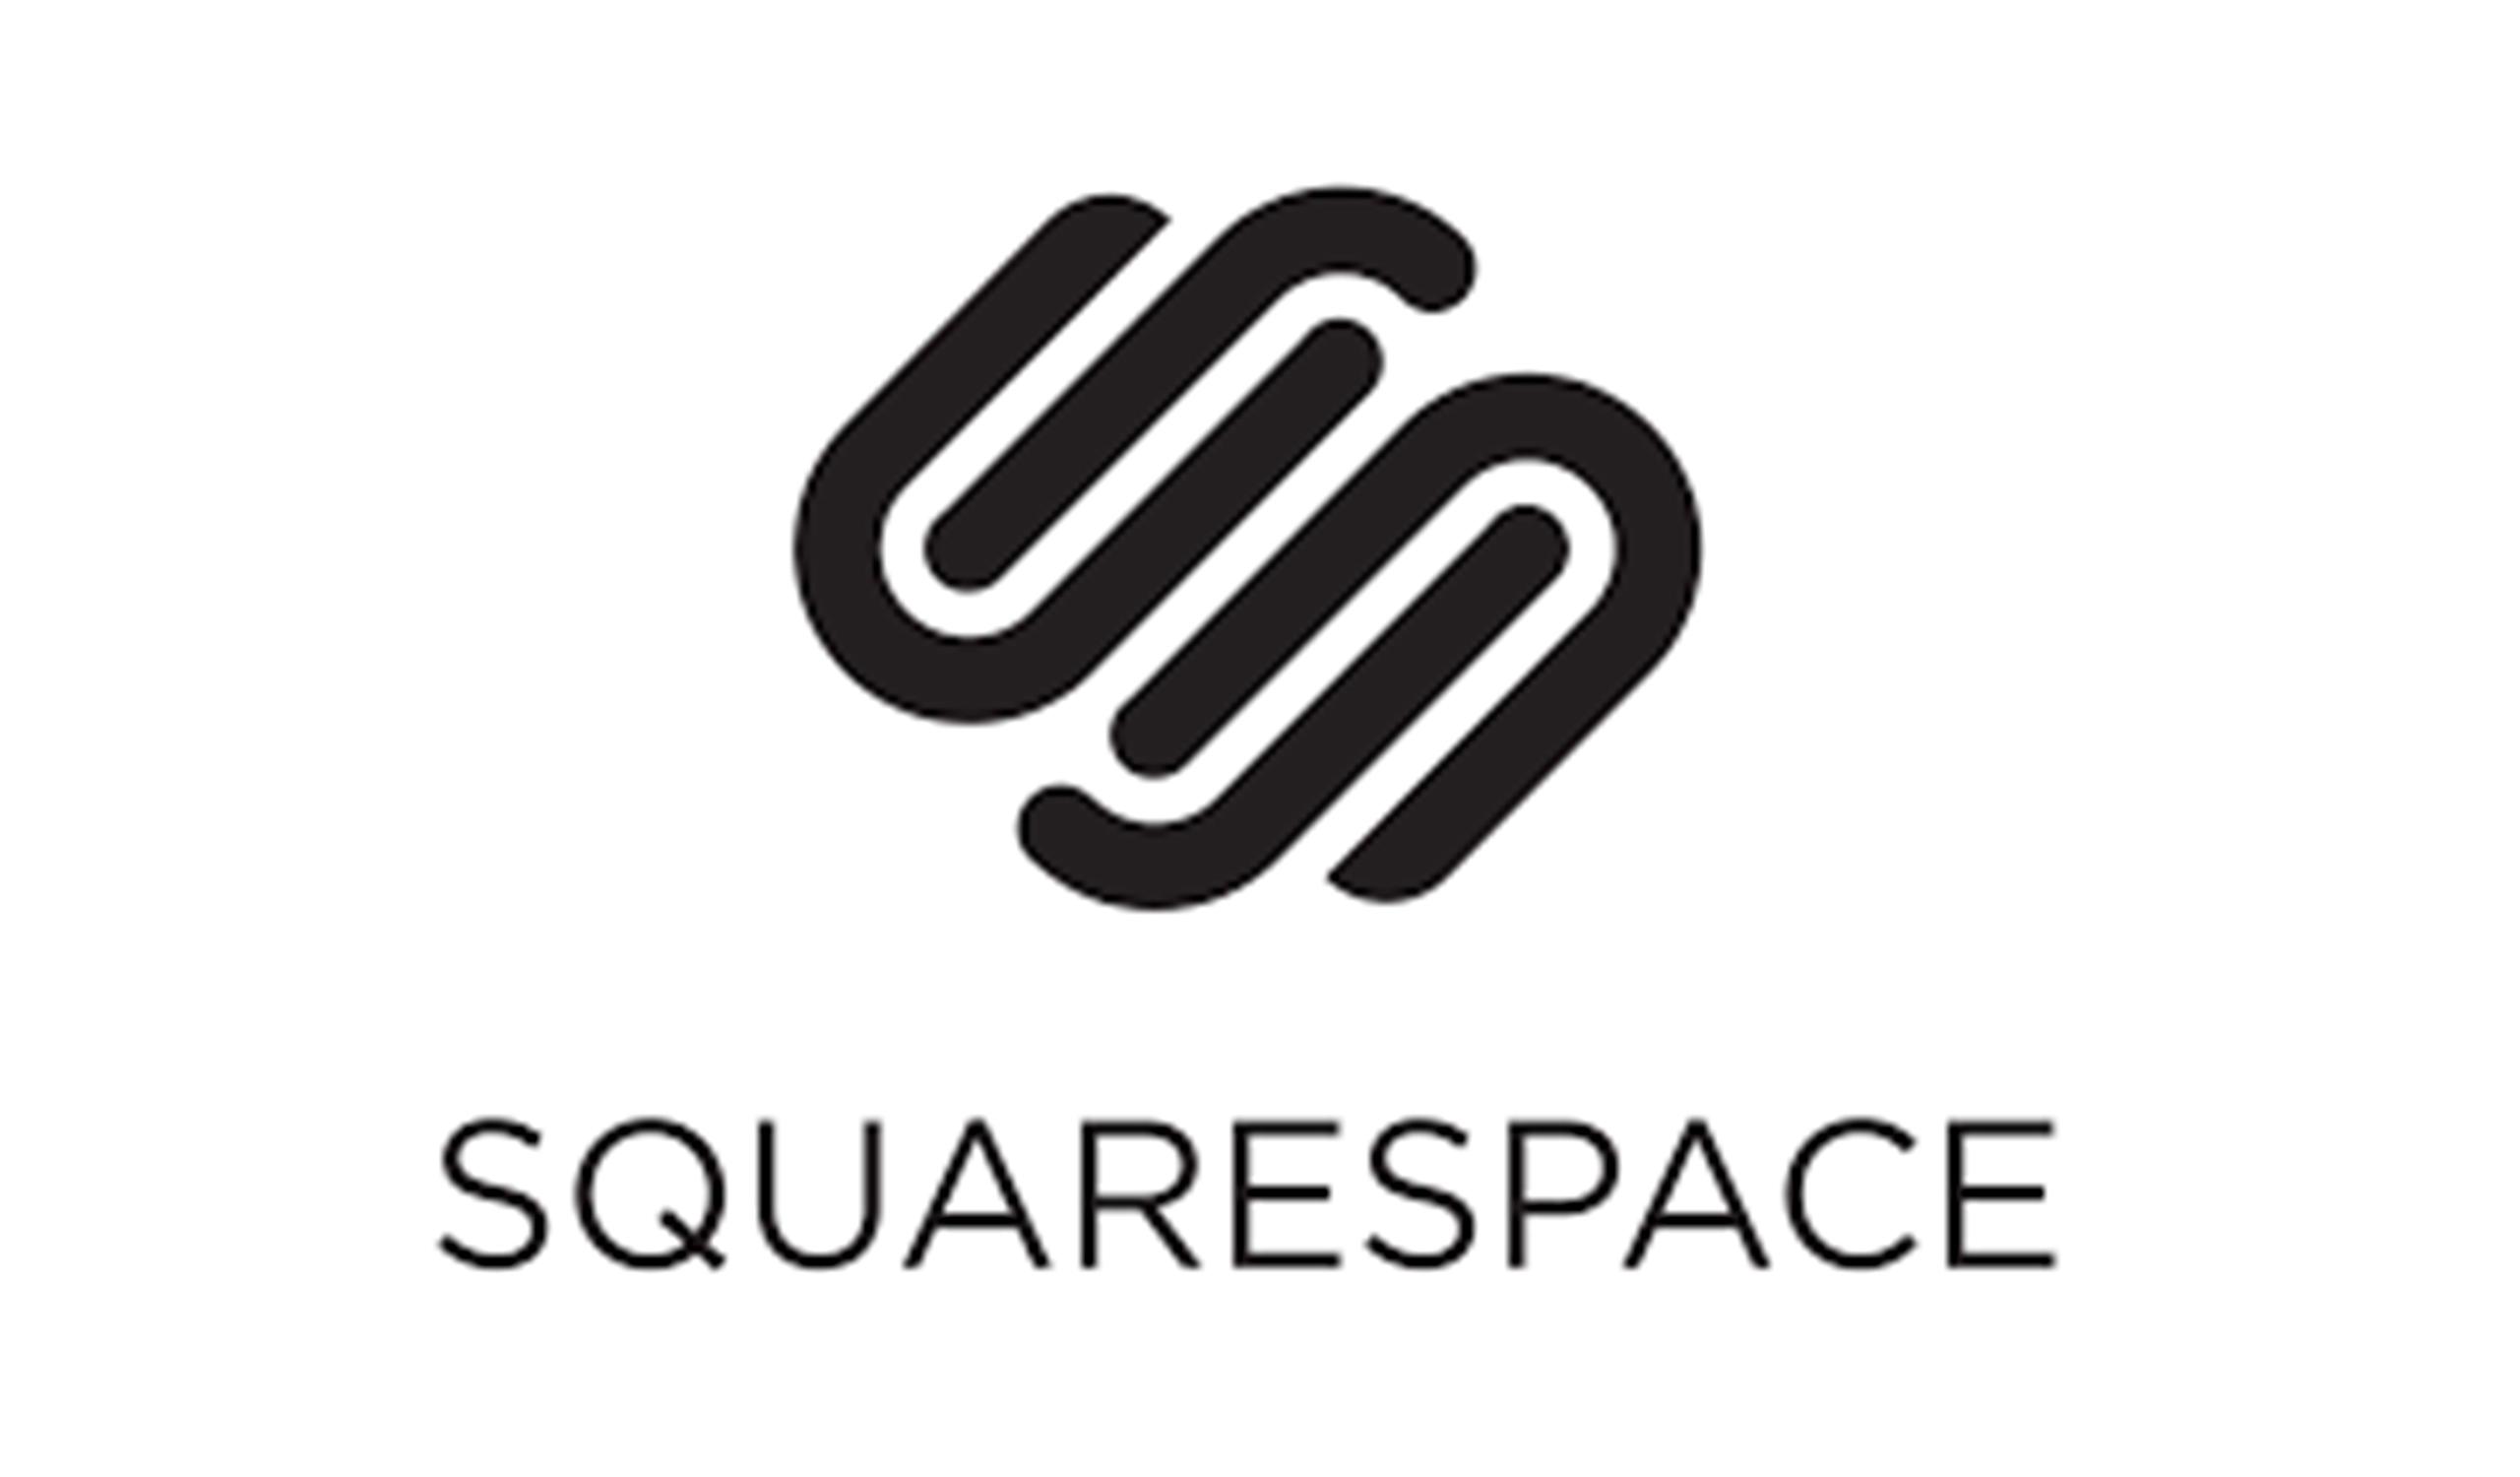 cuckhoo-web-design-digital-marketing-industry-skills-square-space